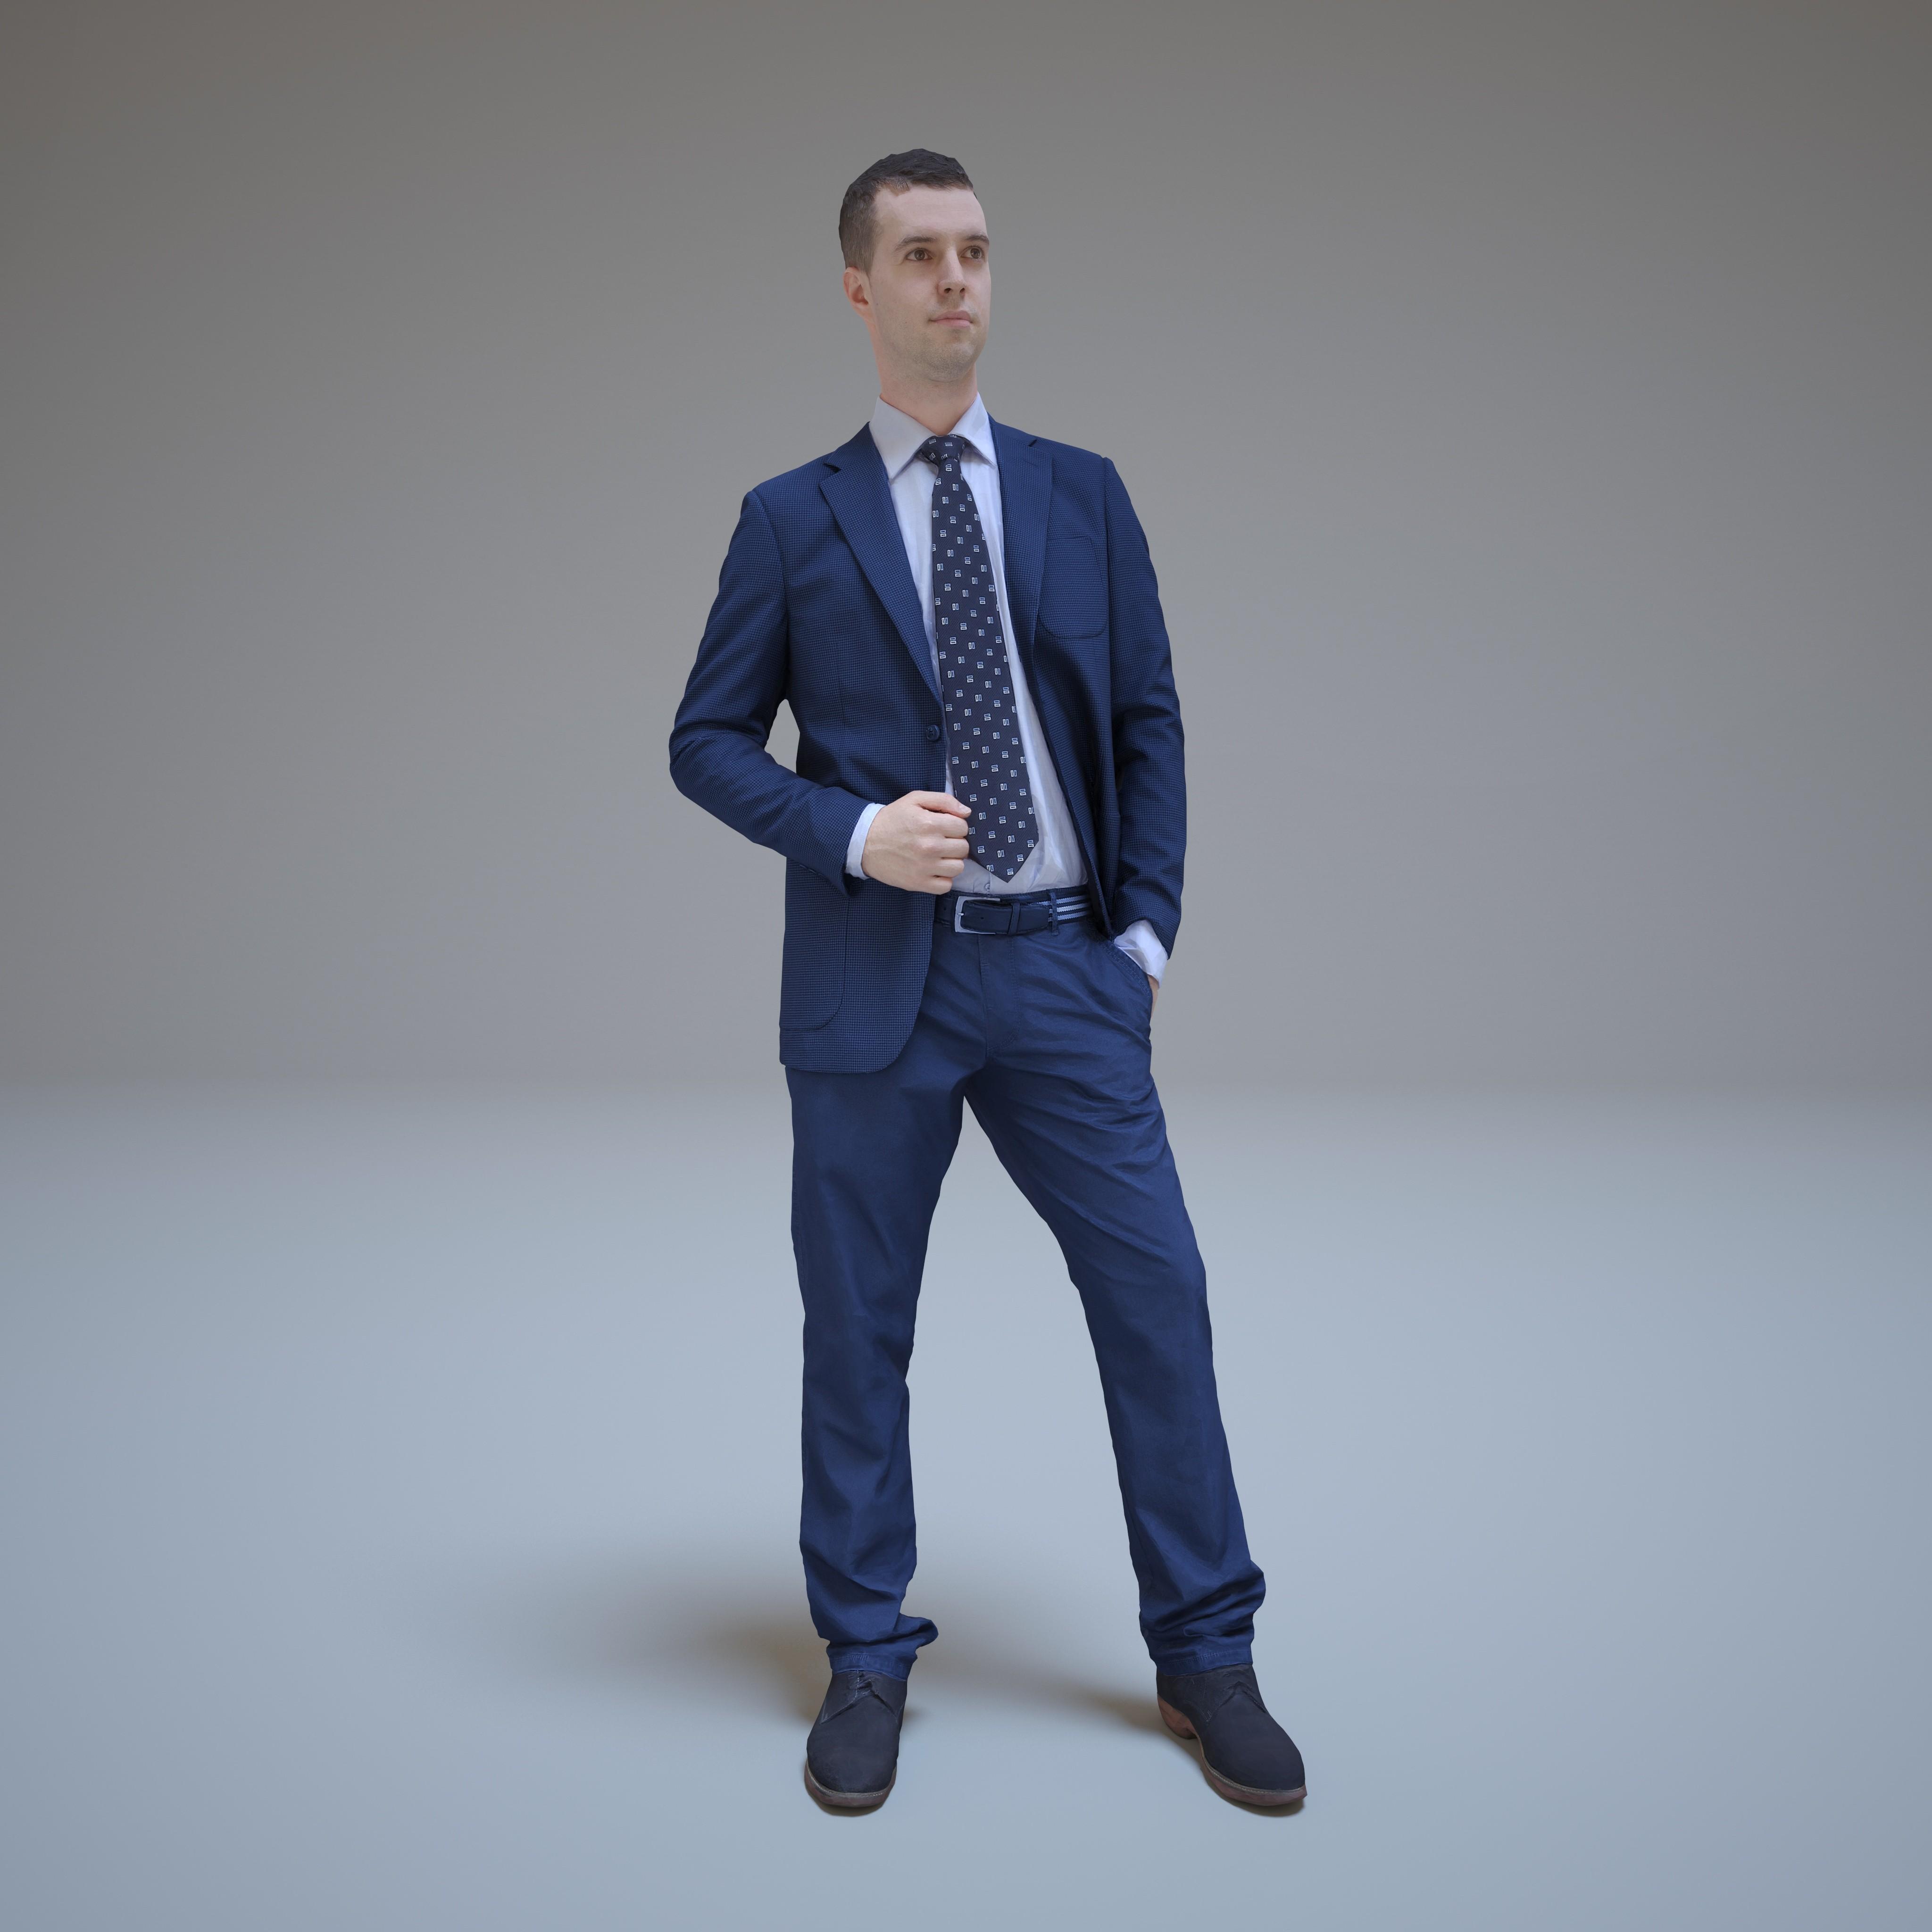 man business 3d model